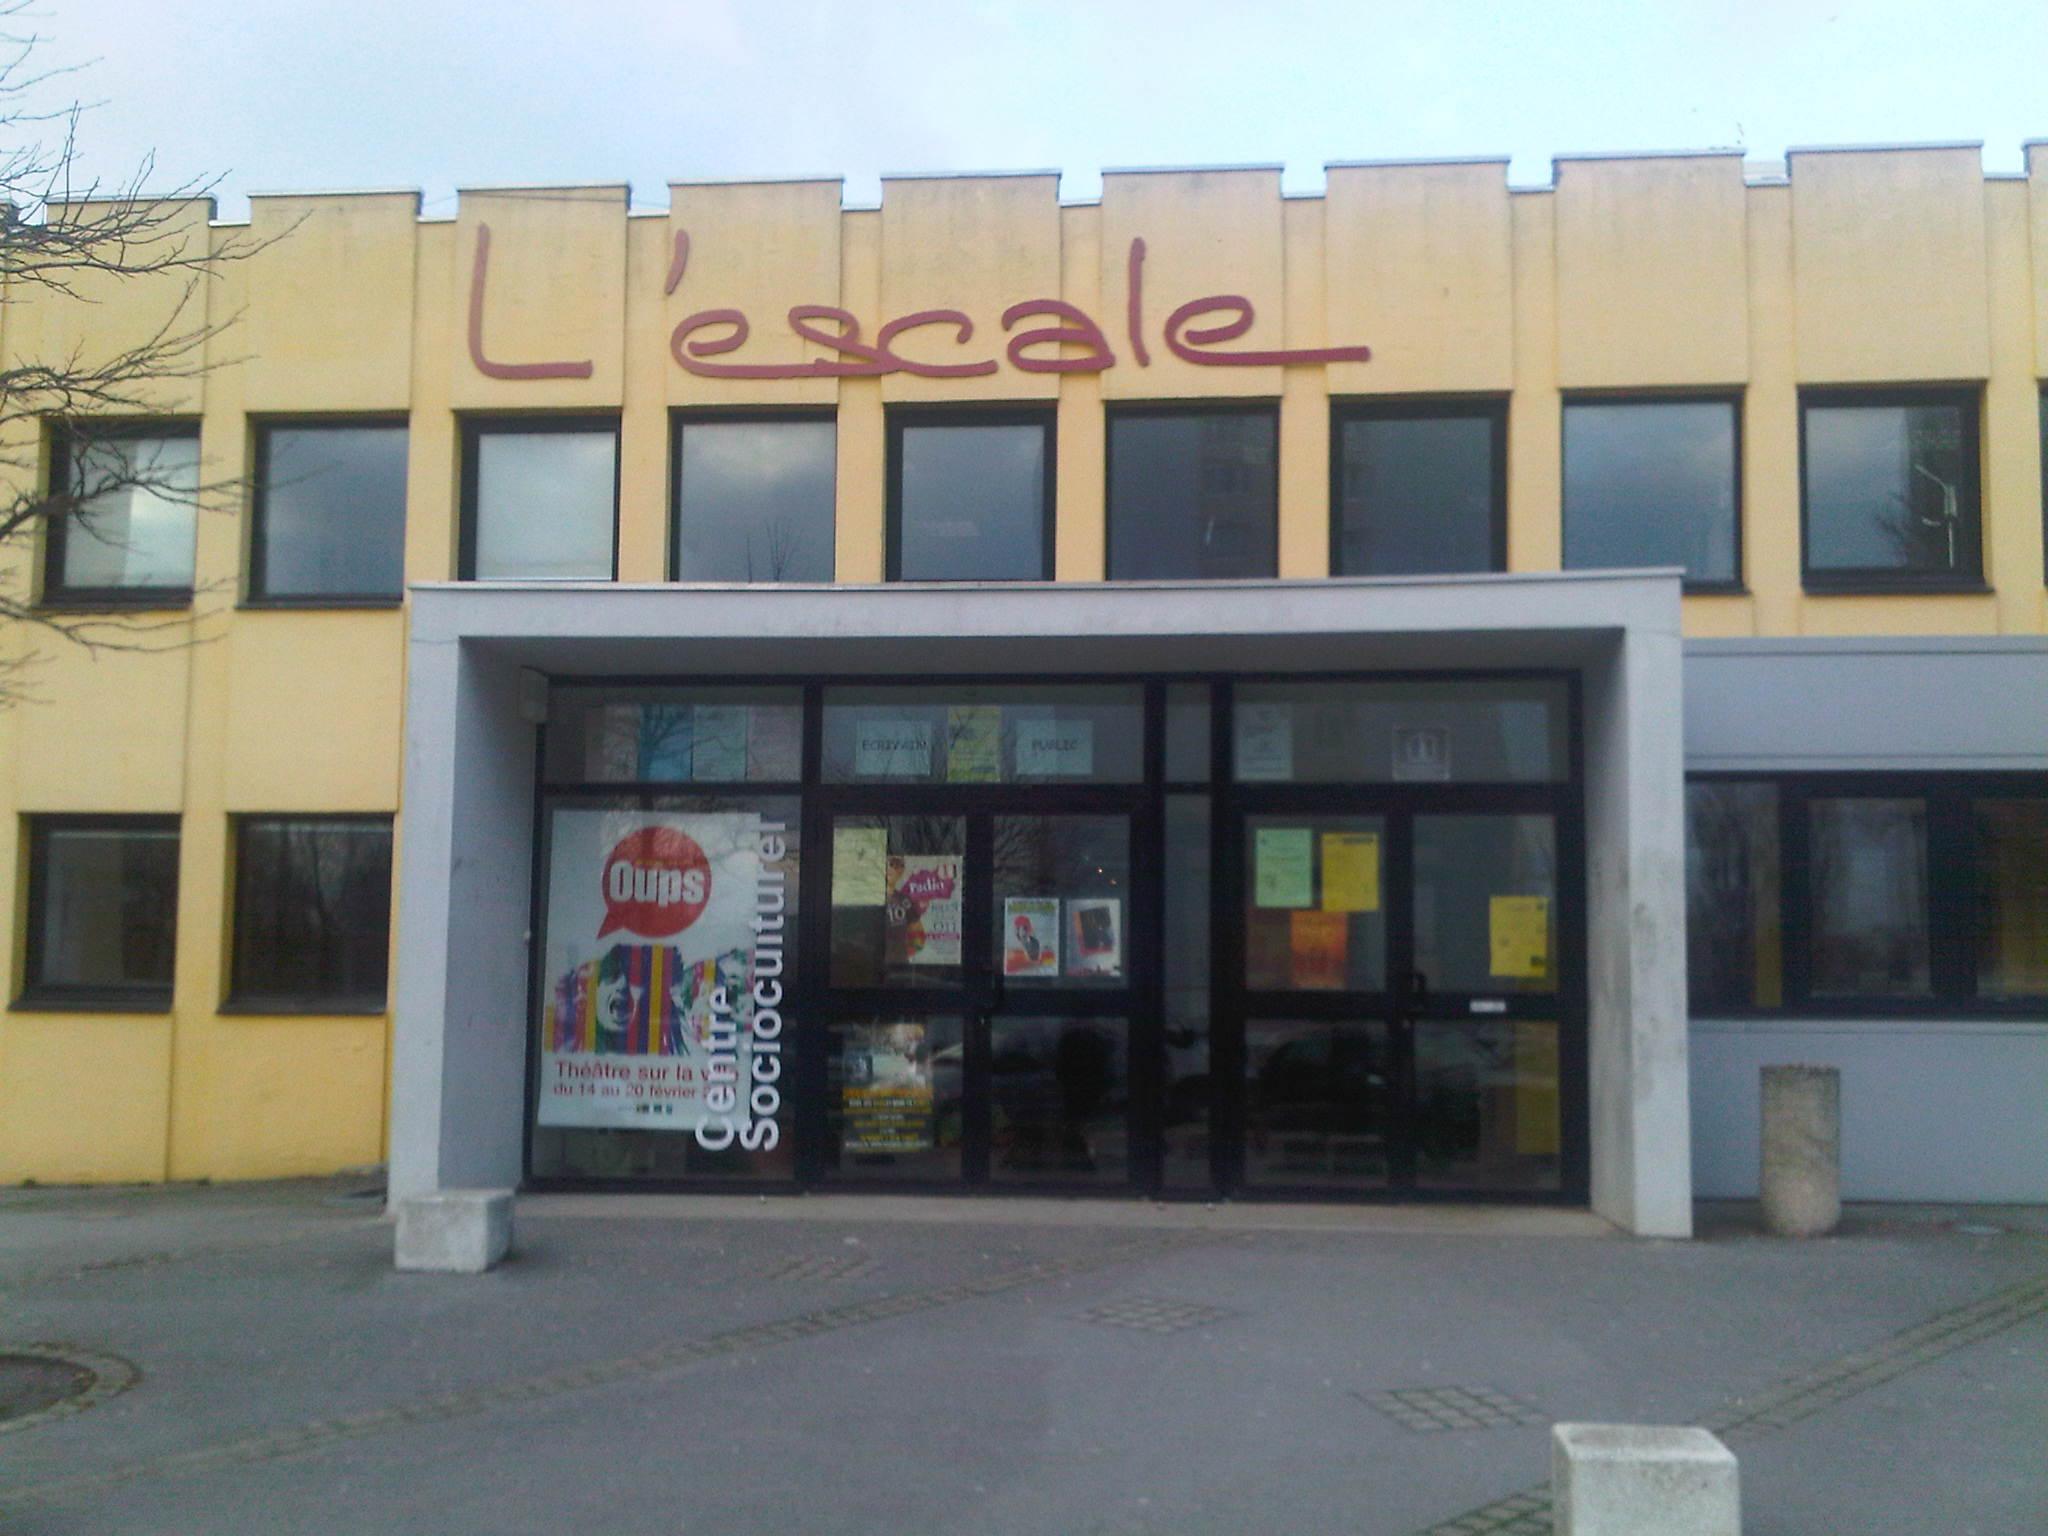 Lescale